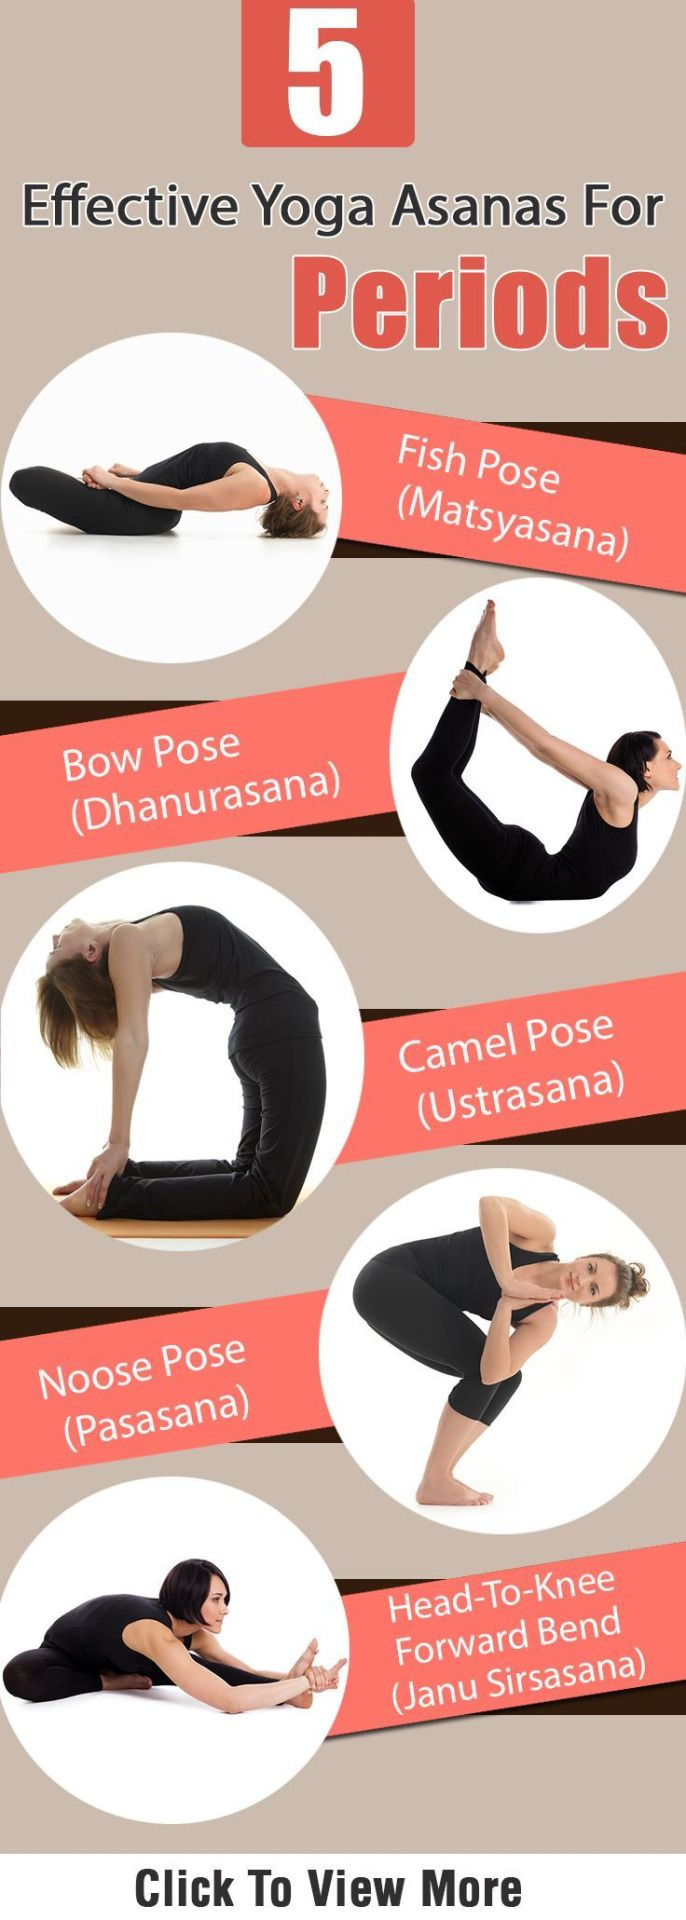 Yoga Poses| www.skinnycoffeeclub.com